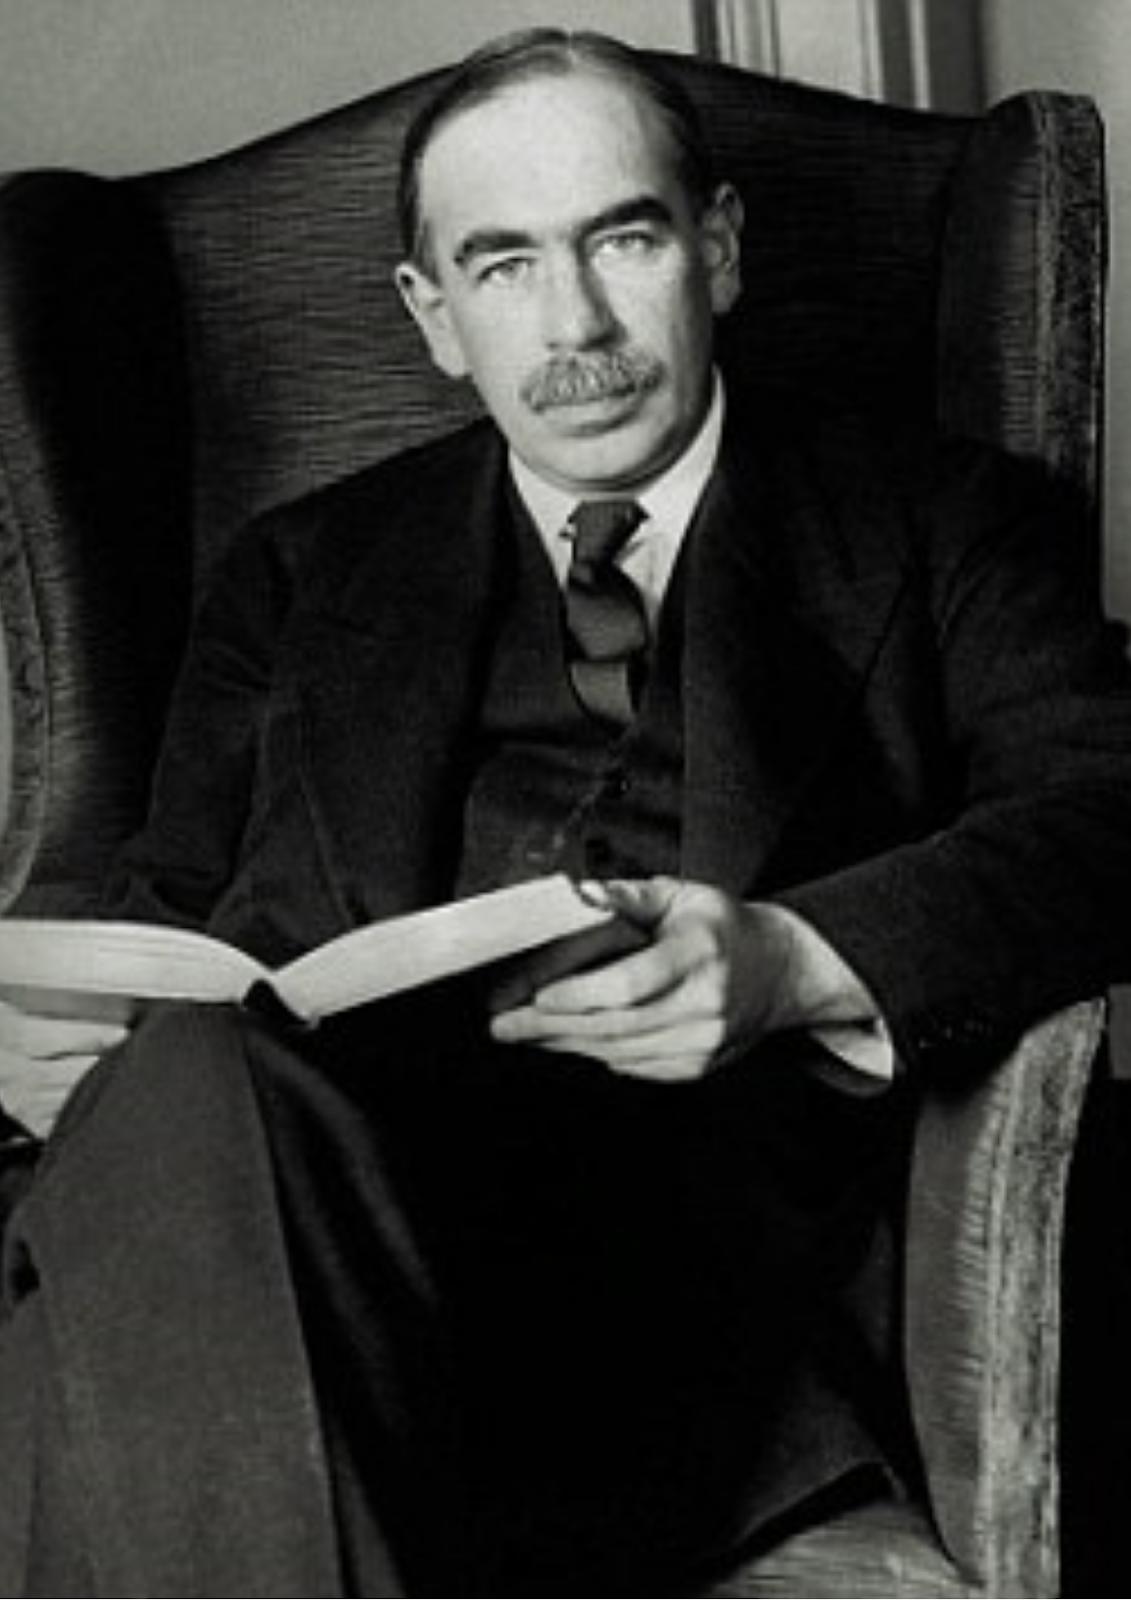 Afi Escuela - Profesores Destacados: John Maynard Keynes